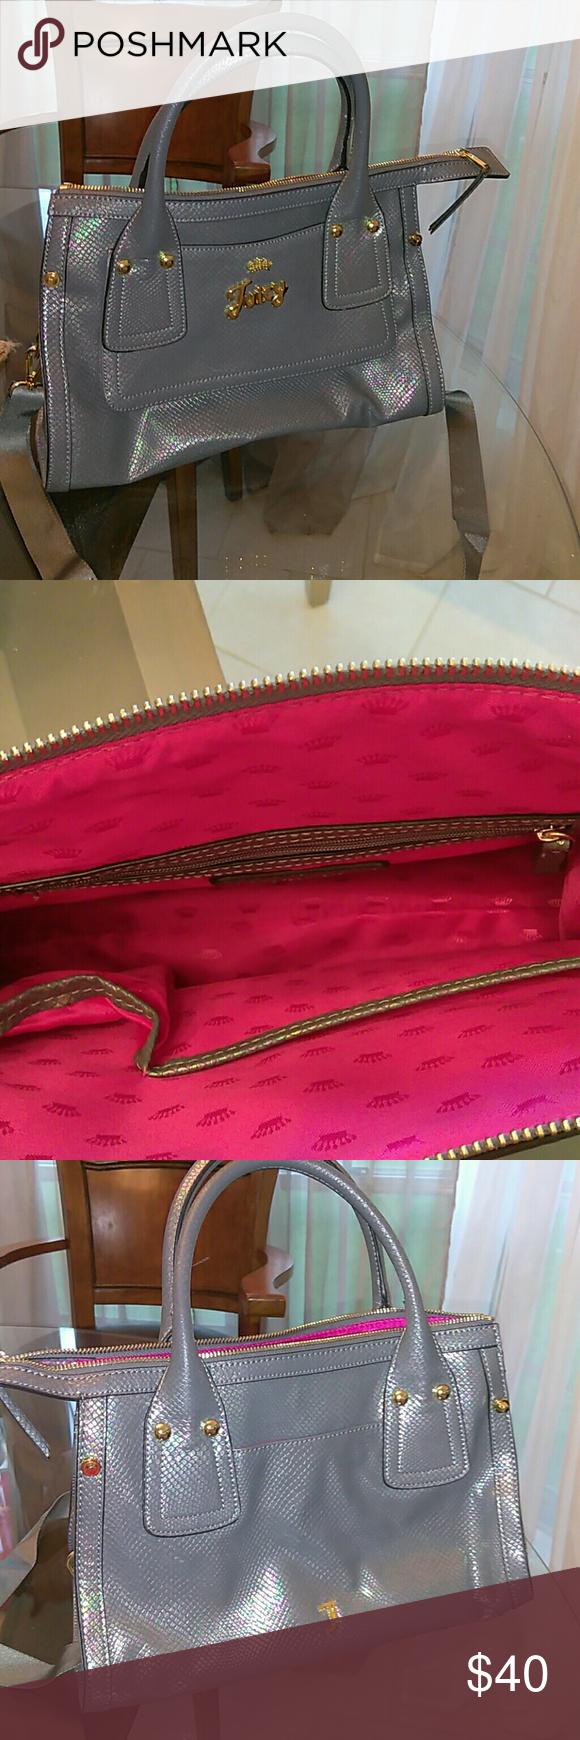 Selling this Juicy purse on Poshmark! My username is: irisivet. #shopmycloset #poshmark #fashion #shopping #style #forsale #Juicy #Handbags